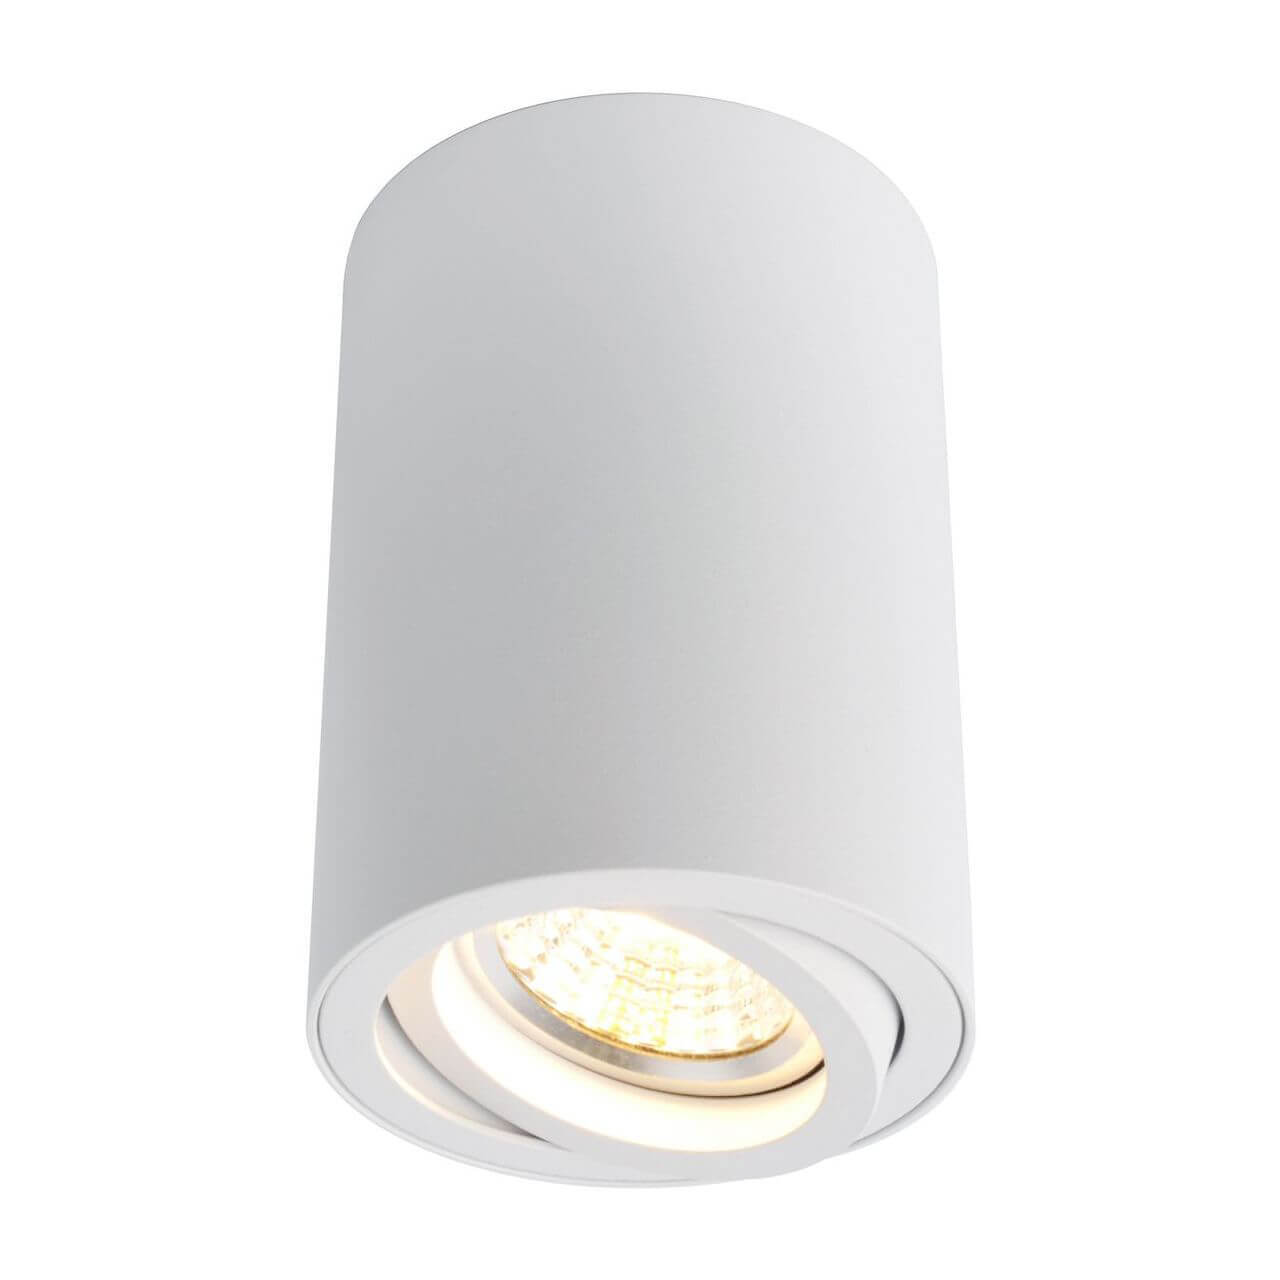 Светильник Arte Lamp A1560PL-1WH 1560